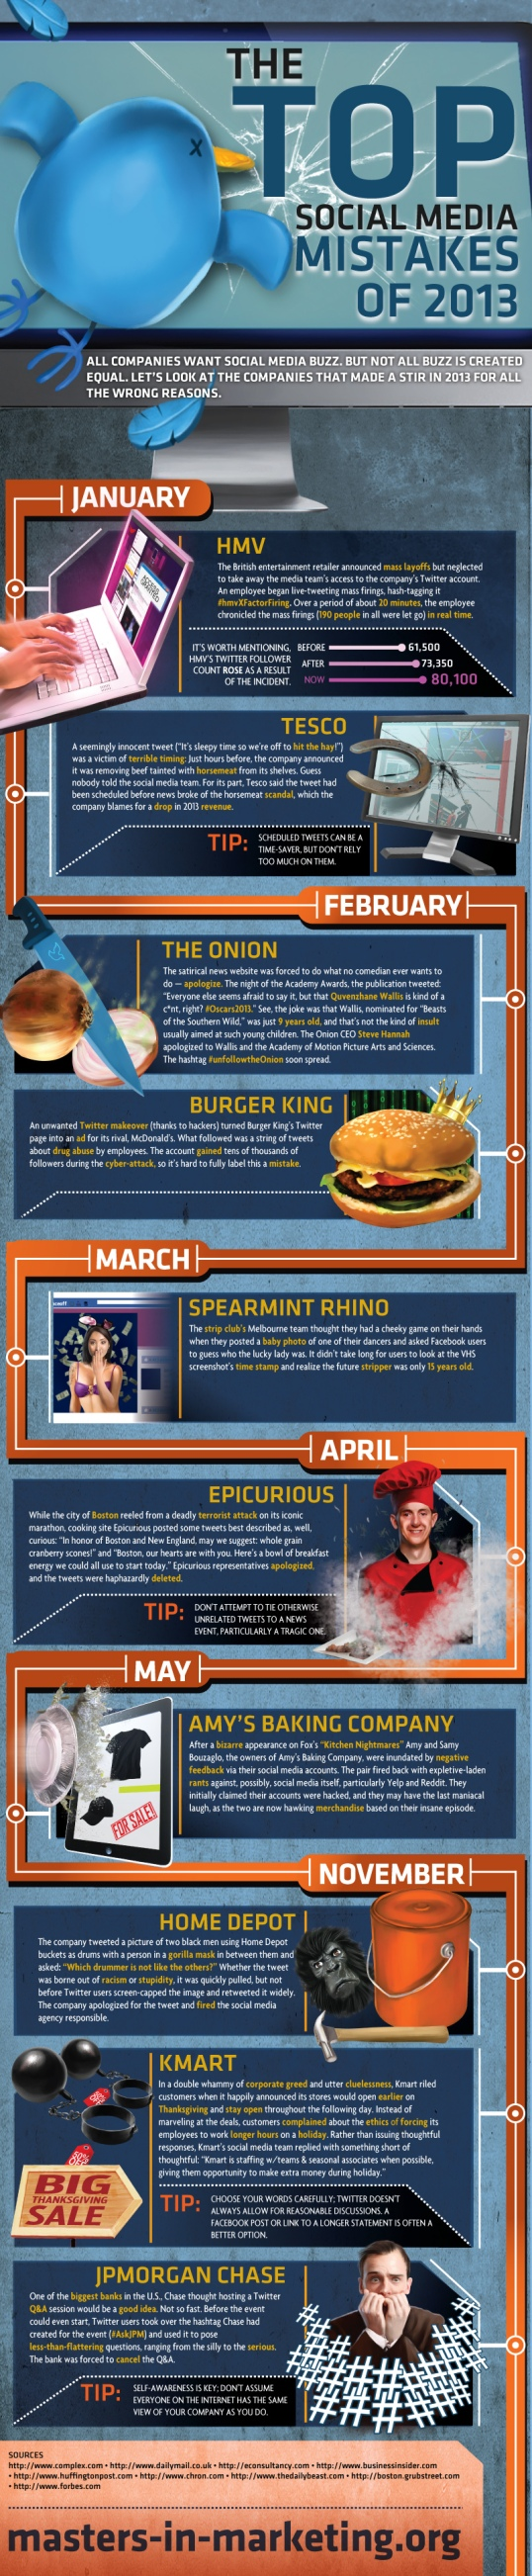 Social Media Fails Infographic